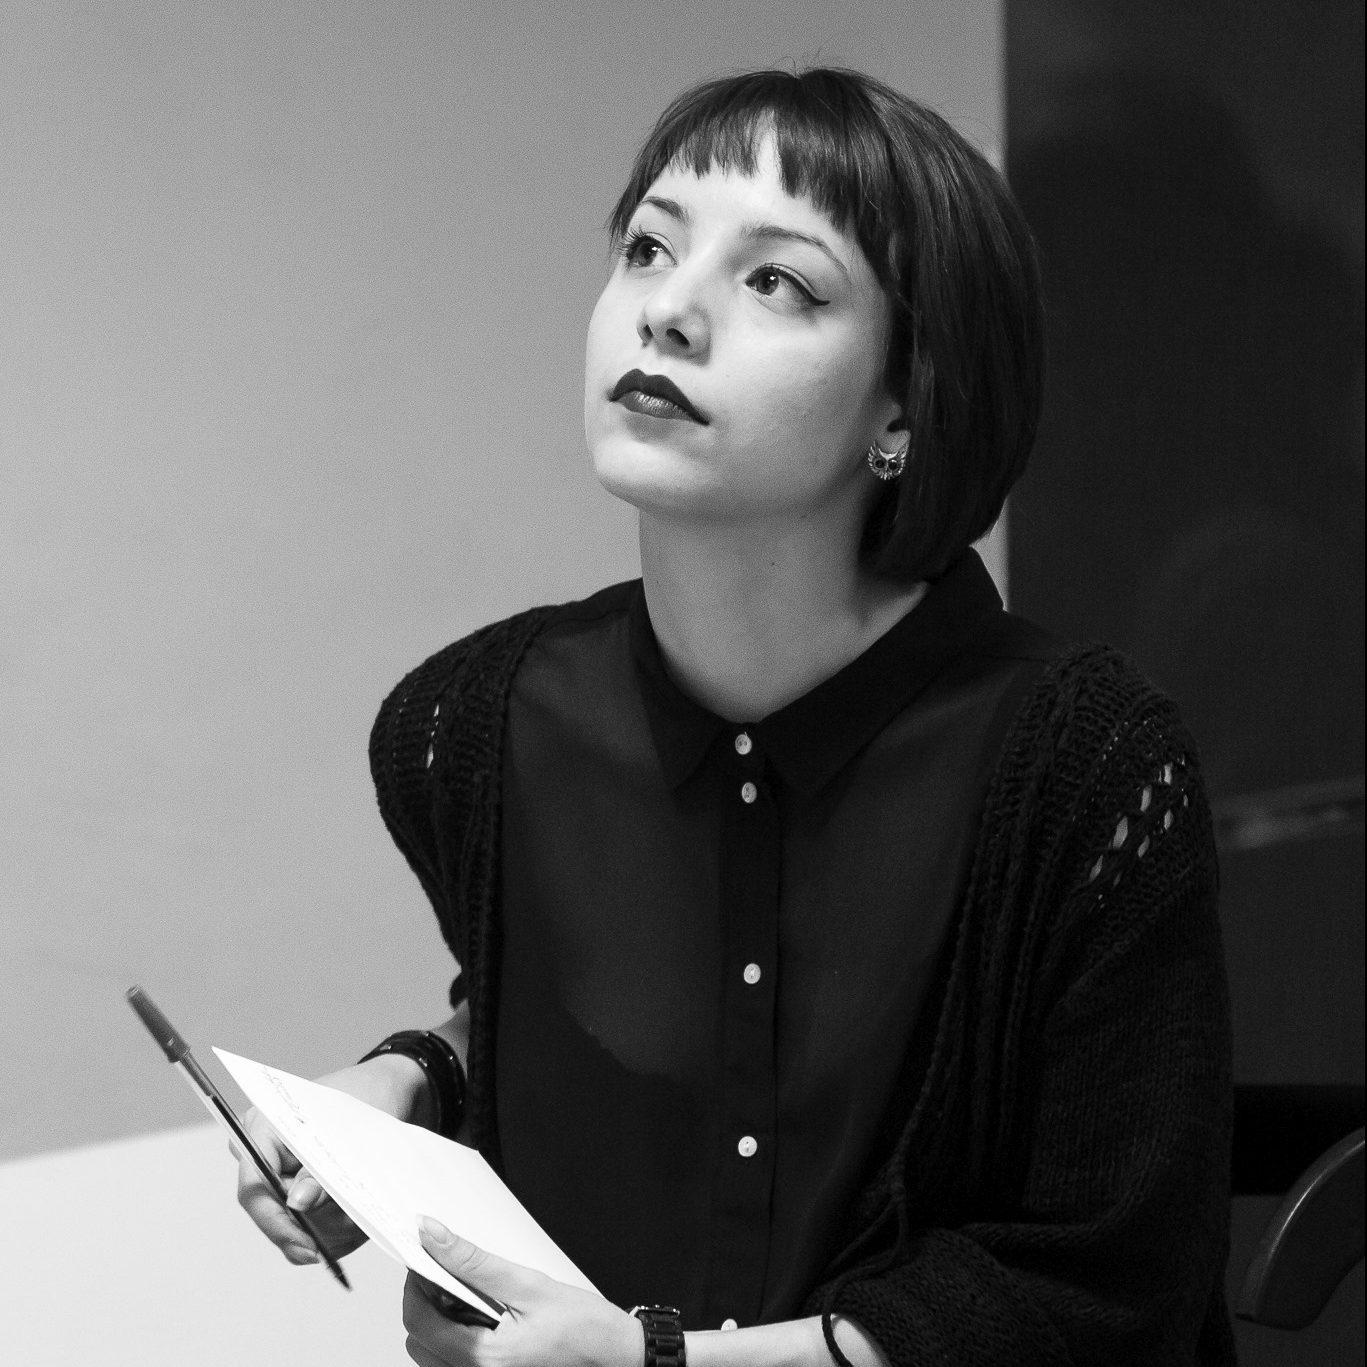 Alina Bucșa